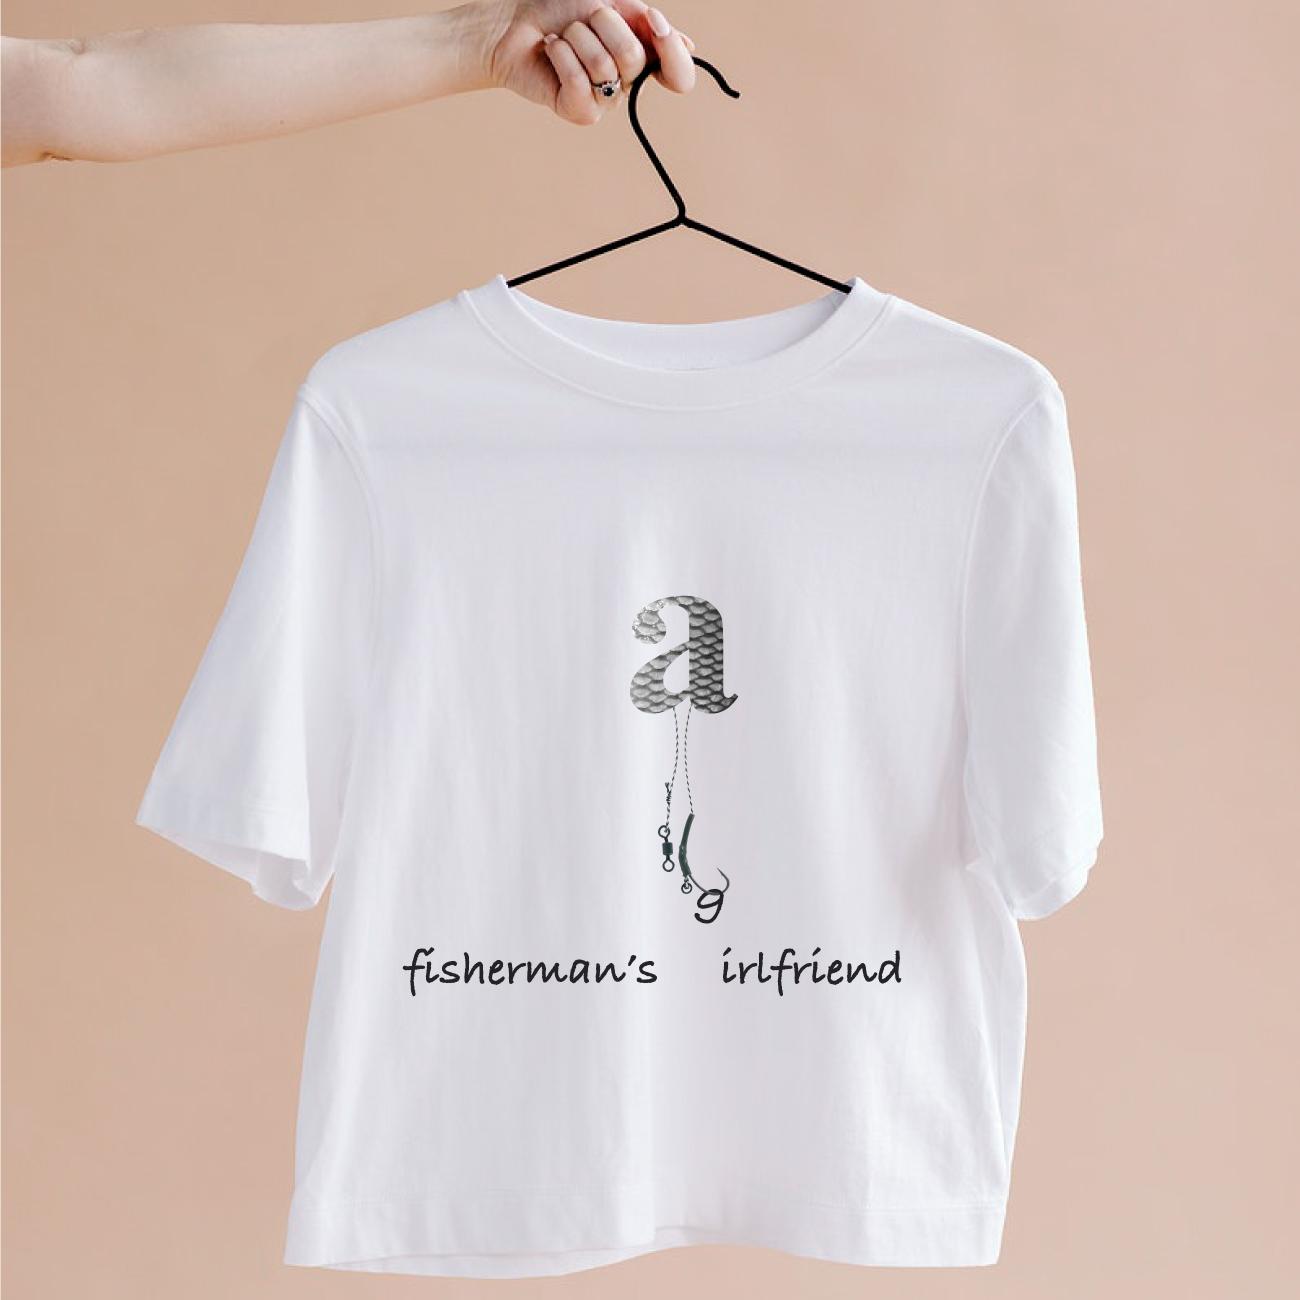 t-shirt design fishermans girlfriend